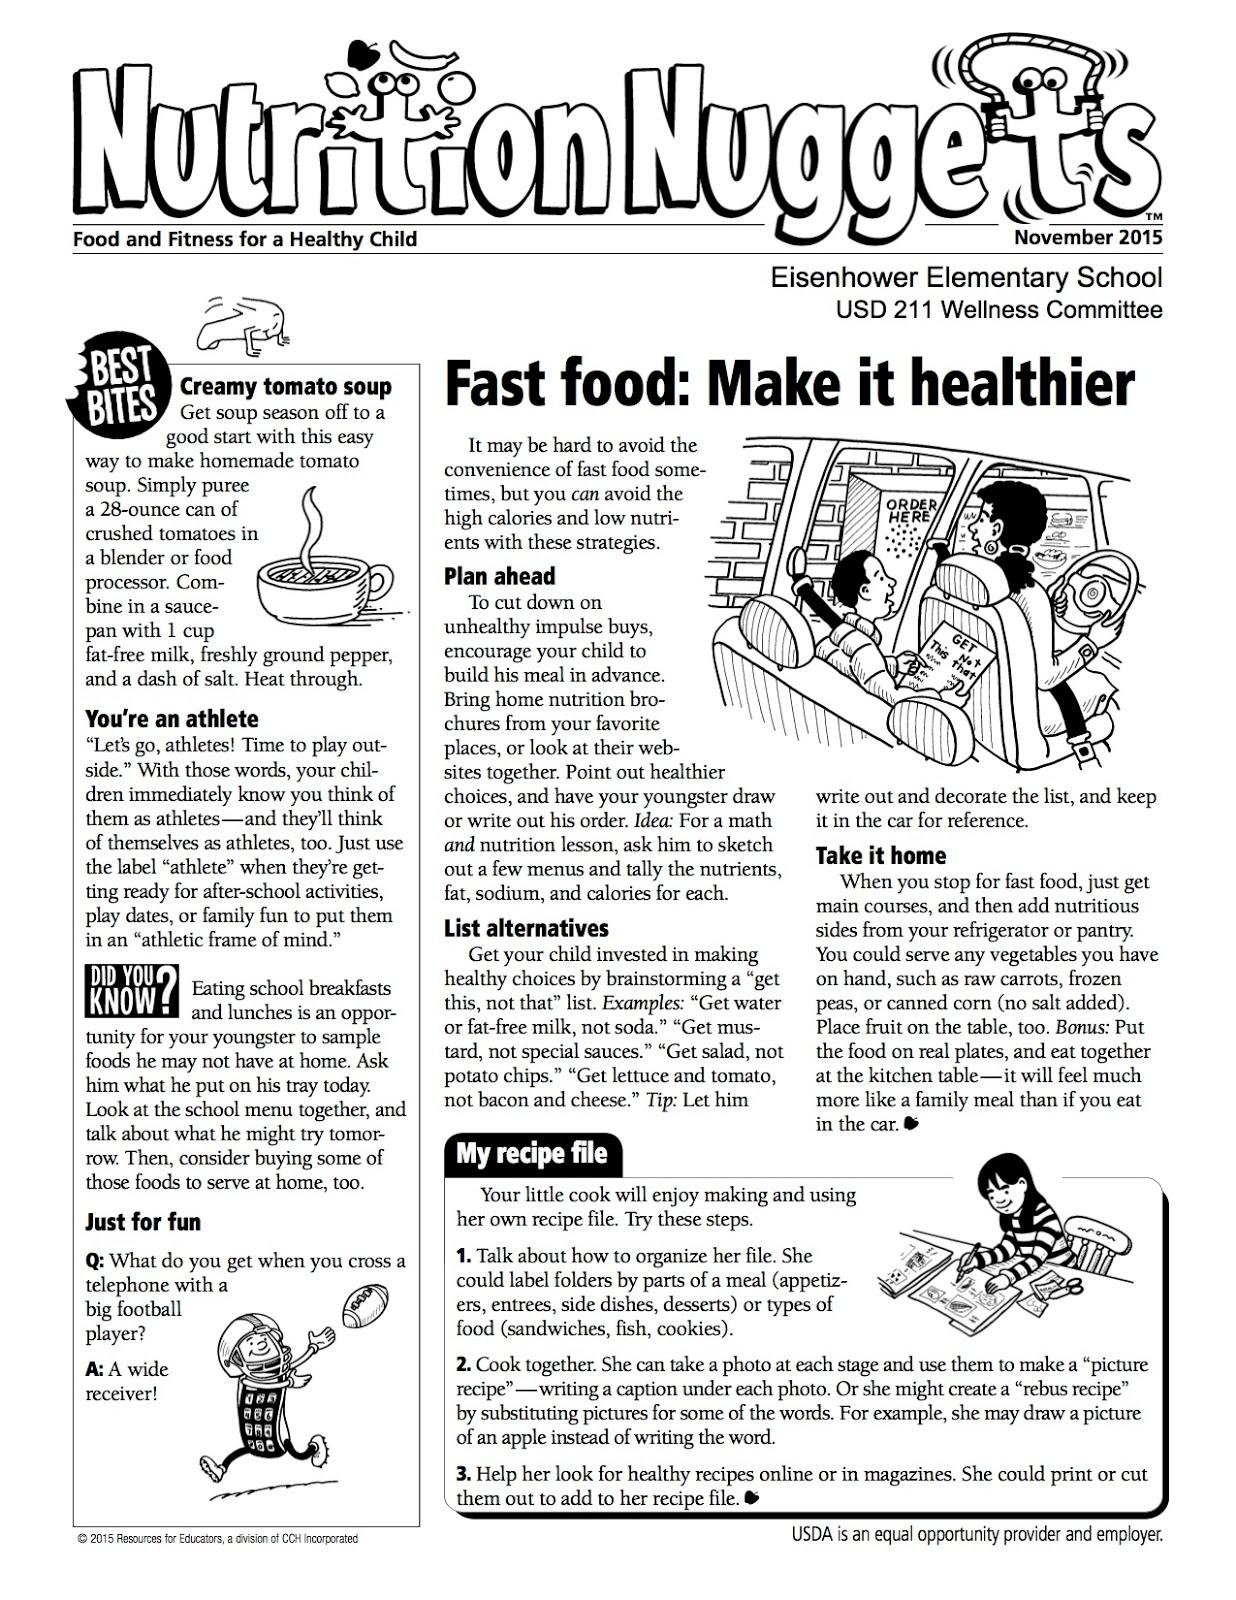 November Nutrition Nugget